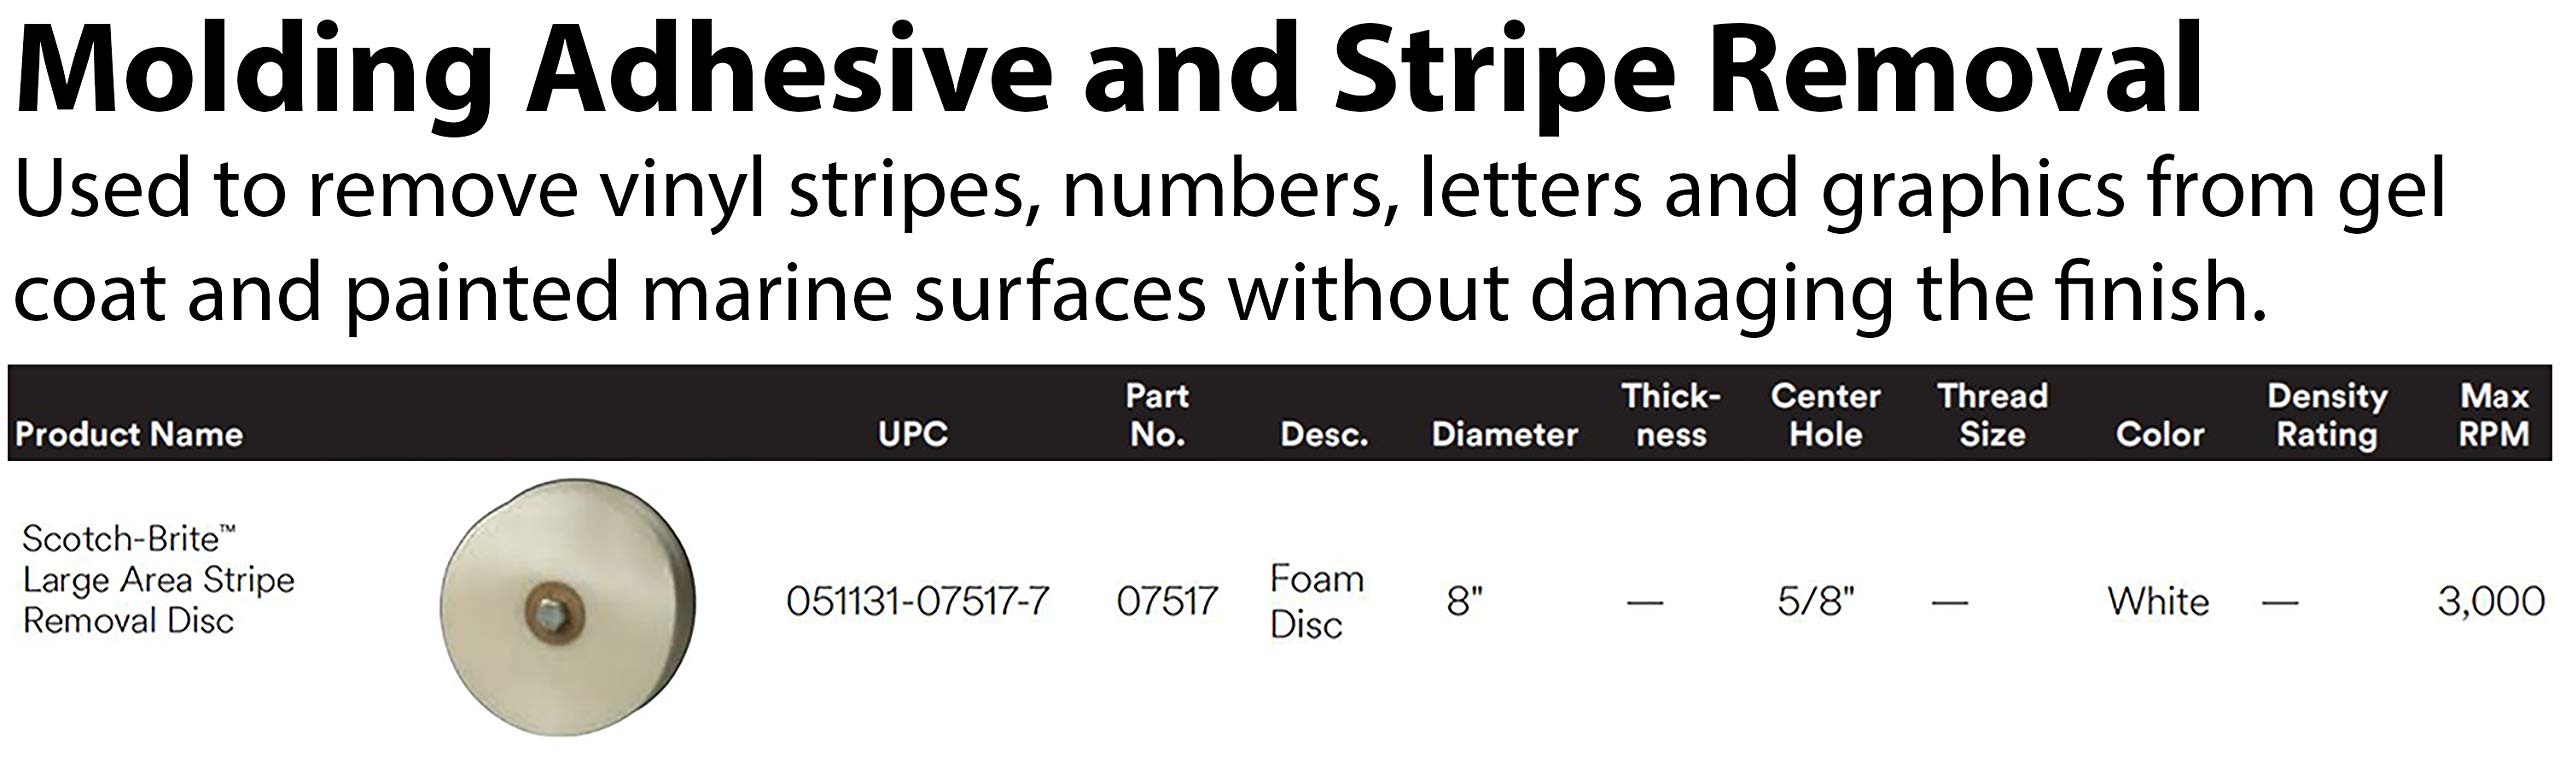 Scotch-Brite(TM) Large Area Stripe Removal Disc 07517, 8'' Diameter, 5/8'' Center Hole Diameter, White (Pack of 1) by Cubitron